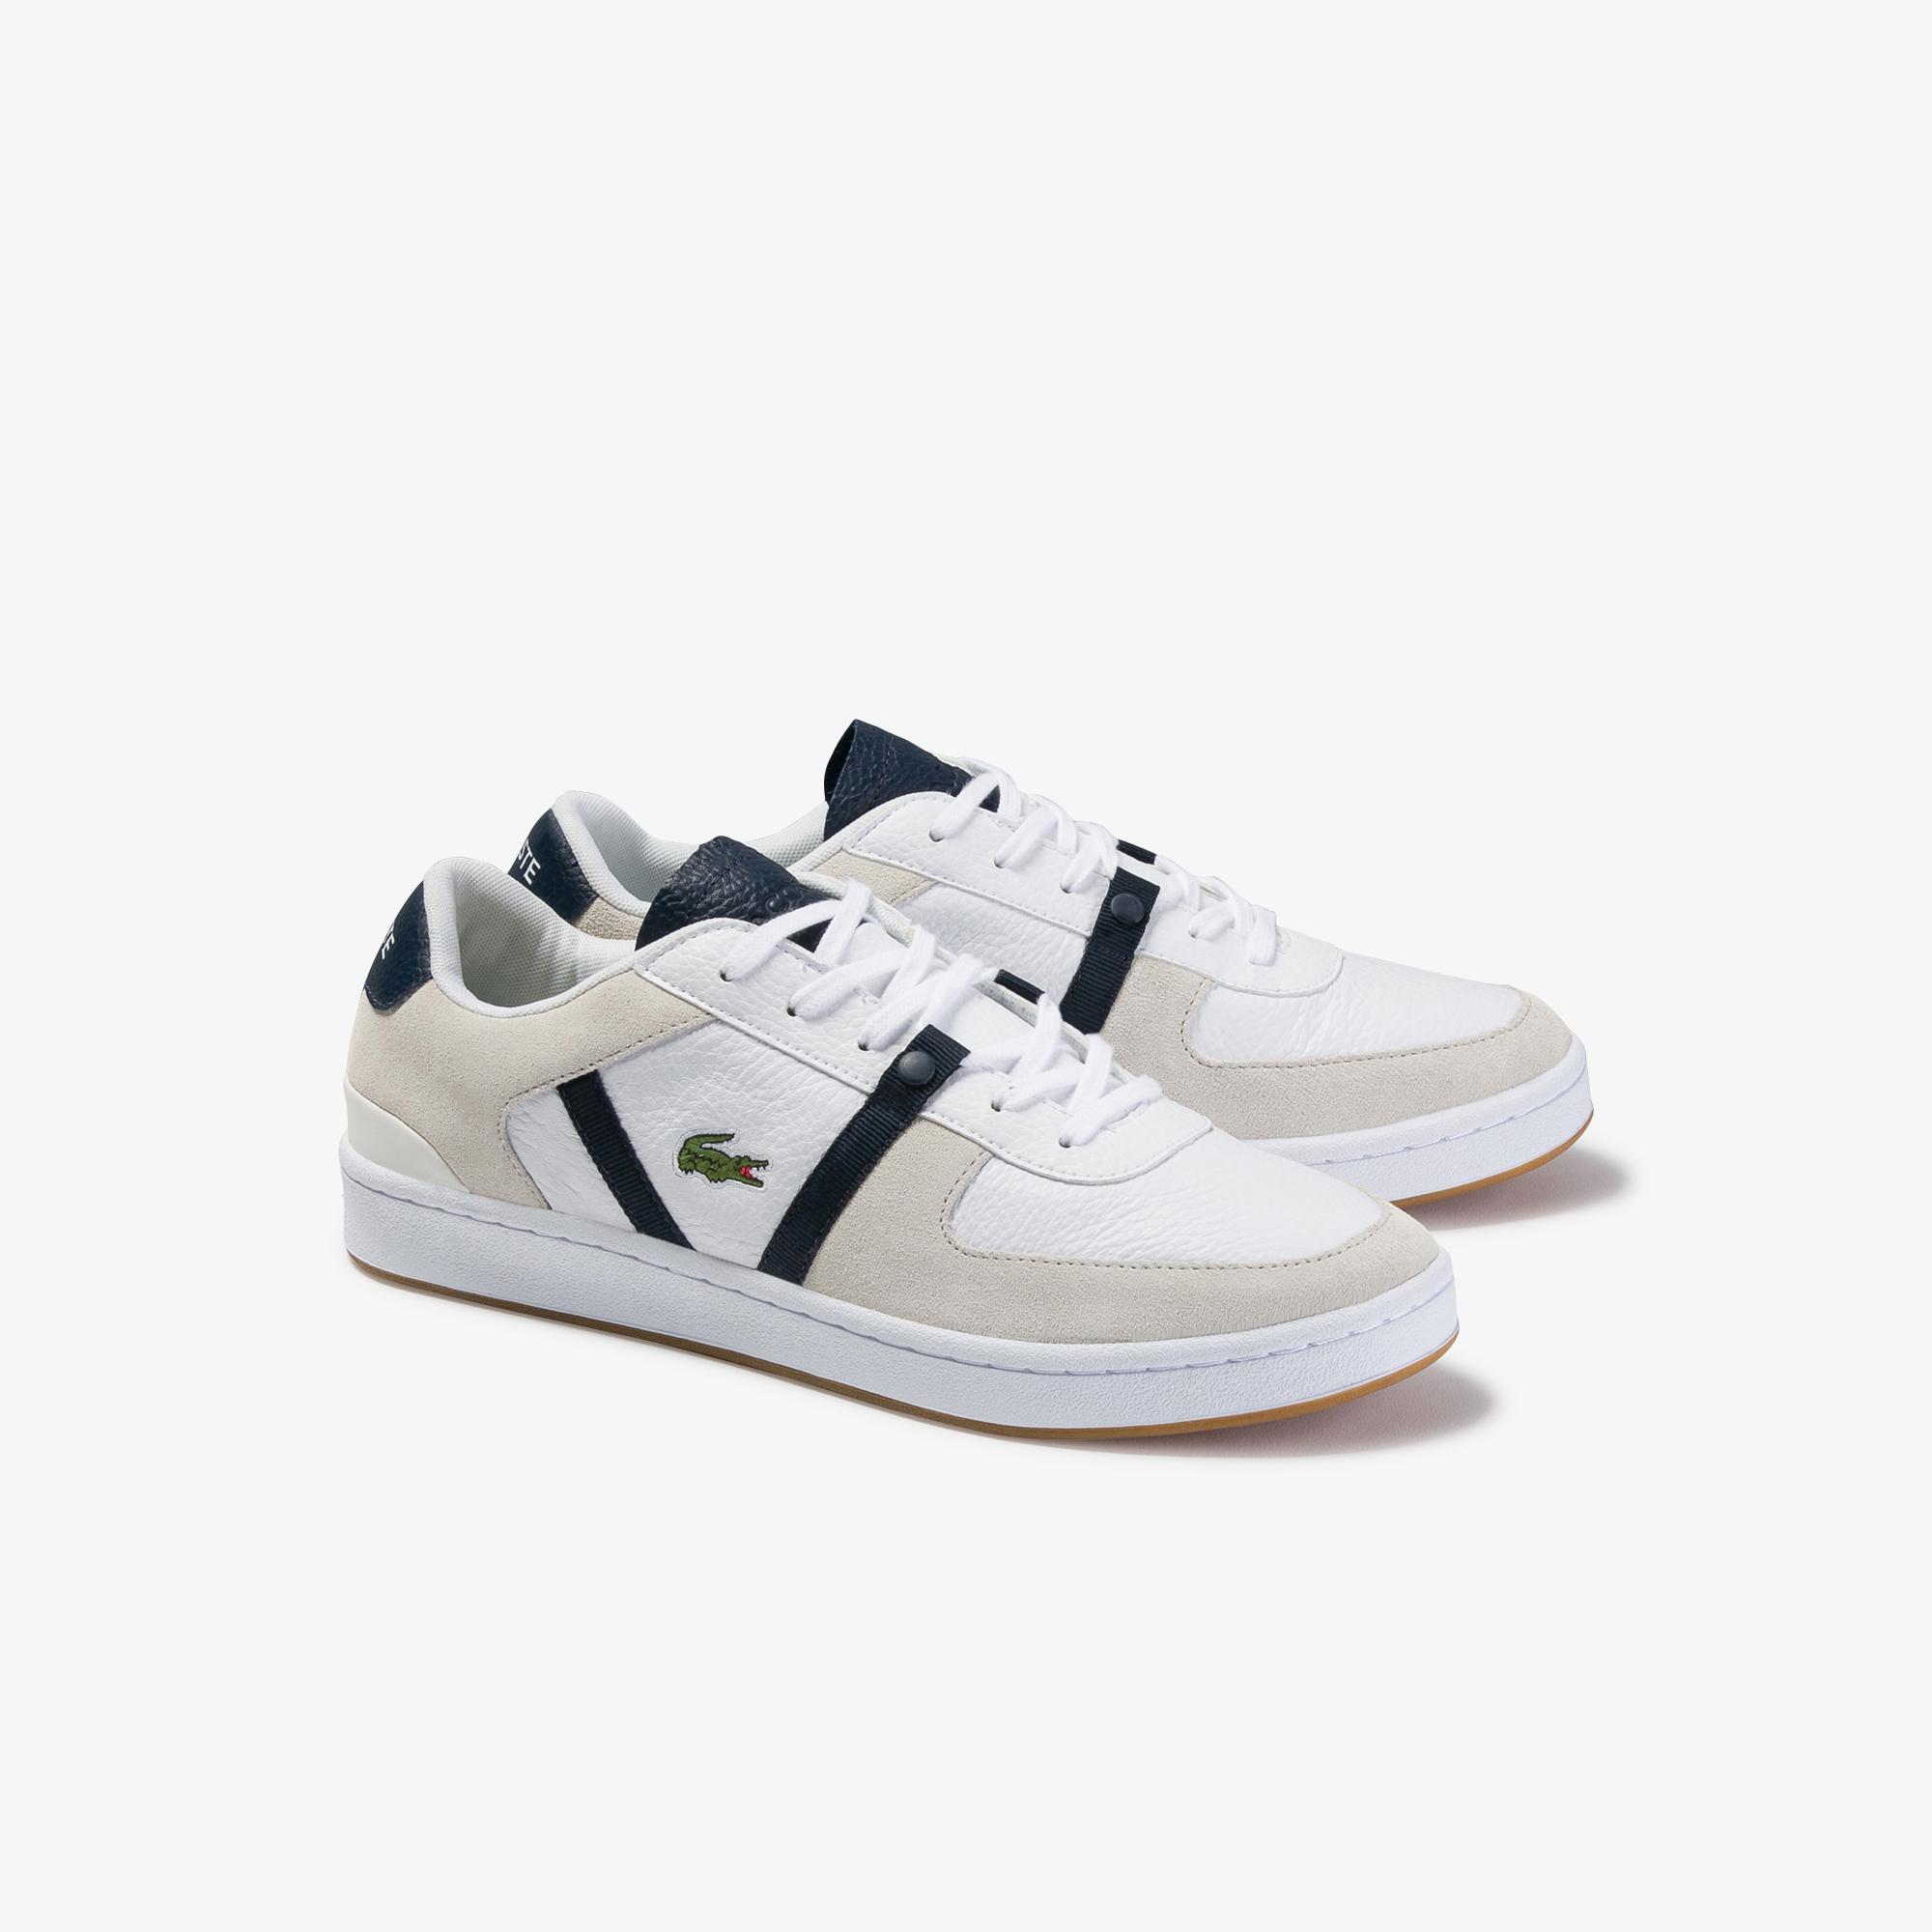 Lacoste Splitstep 120 2 Męskie Sneakersy